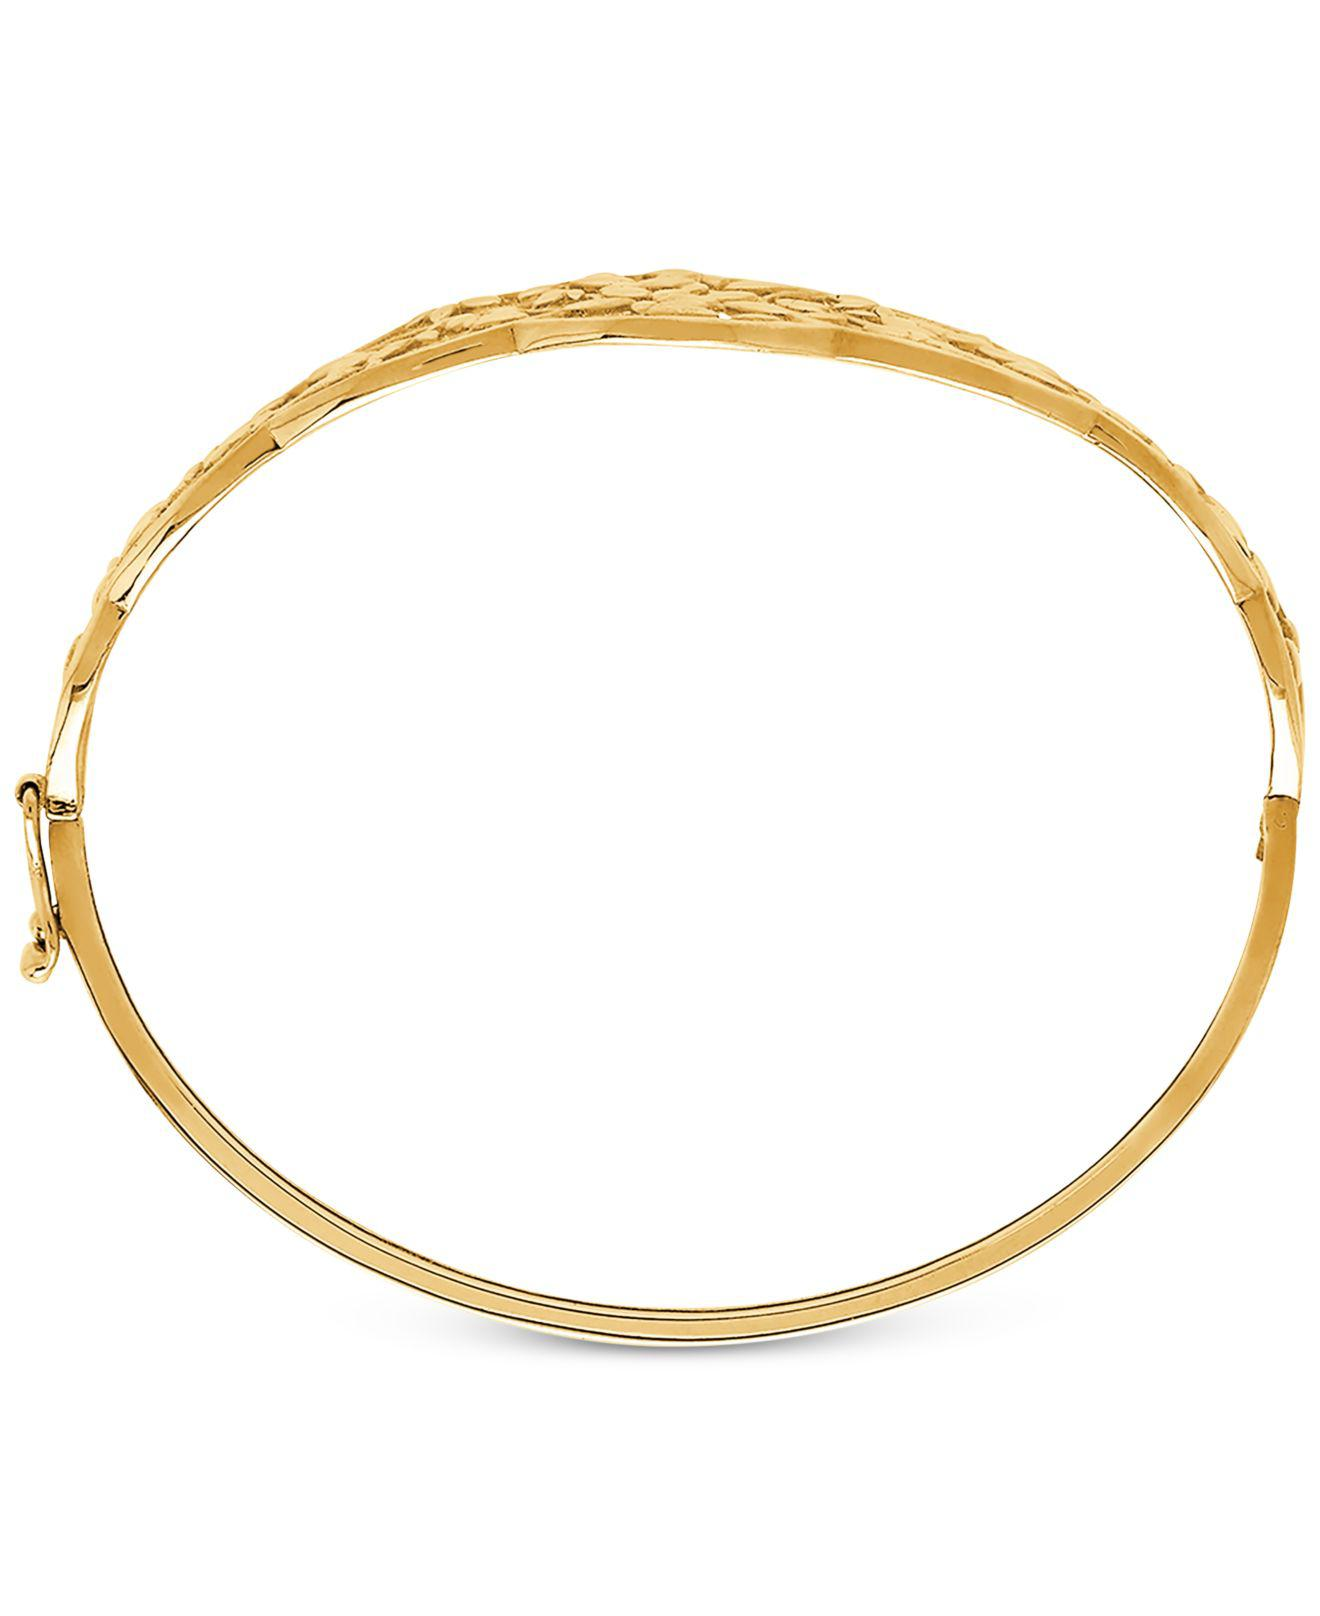 59592d0b3df9b Women's Metallic Openwork Vine Bangle Bracelet In 10k Gold